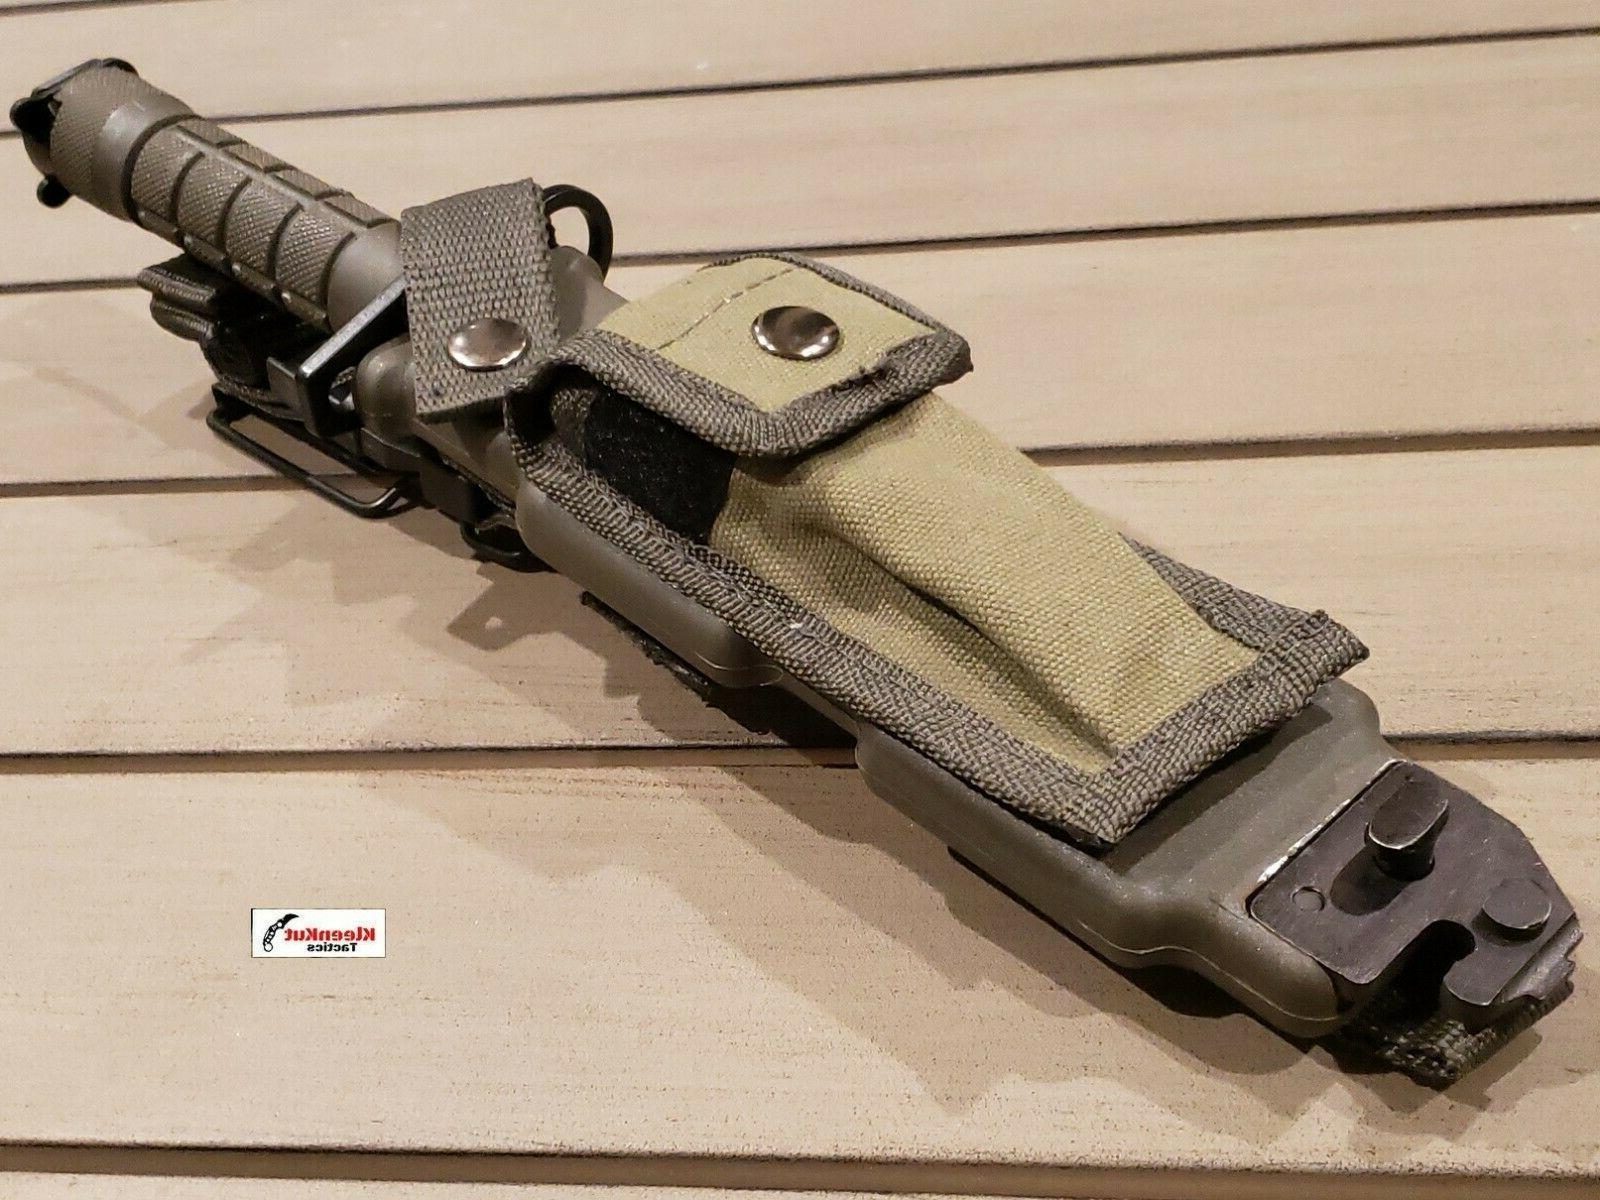 M9 Bayonet Tactical Survival Knife Sheath